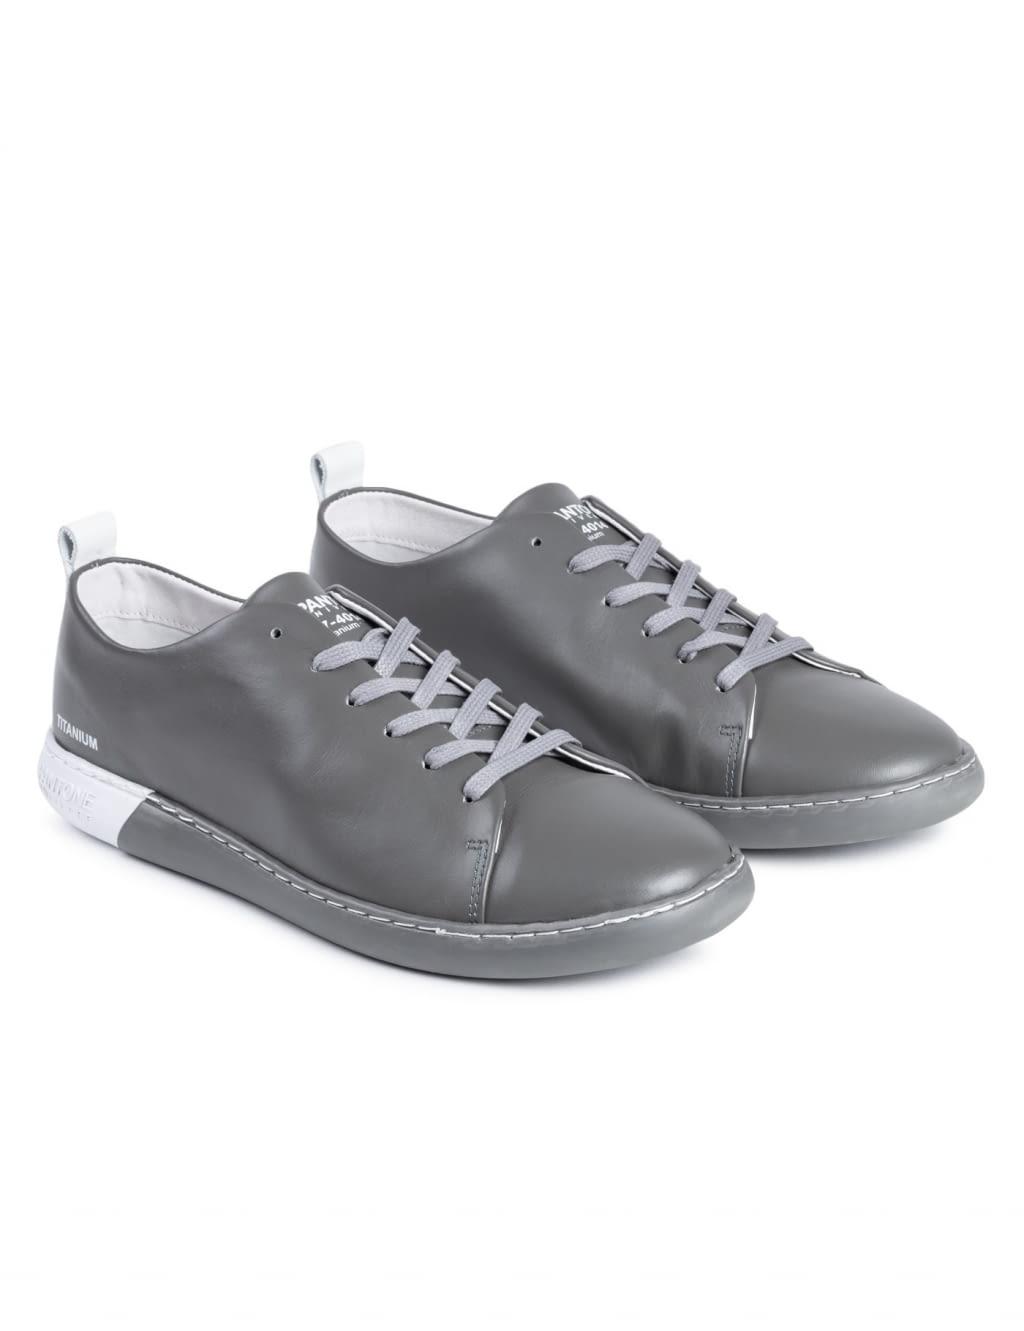 Nyc Cuir Métallique - Chaussures - Bas-tops Et Baskets Pantone DGsxKWKo